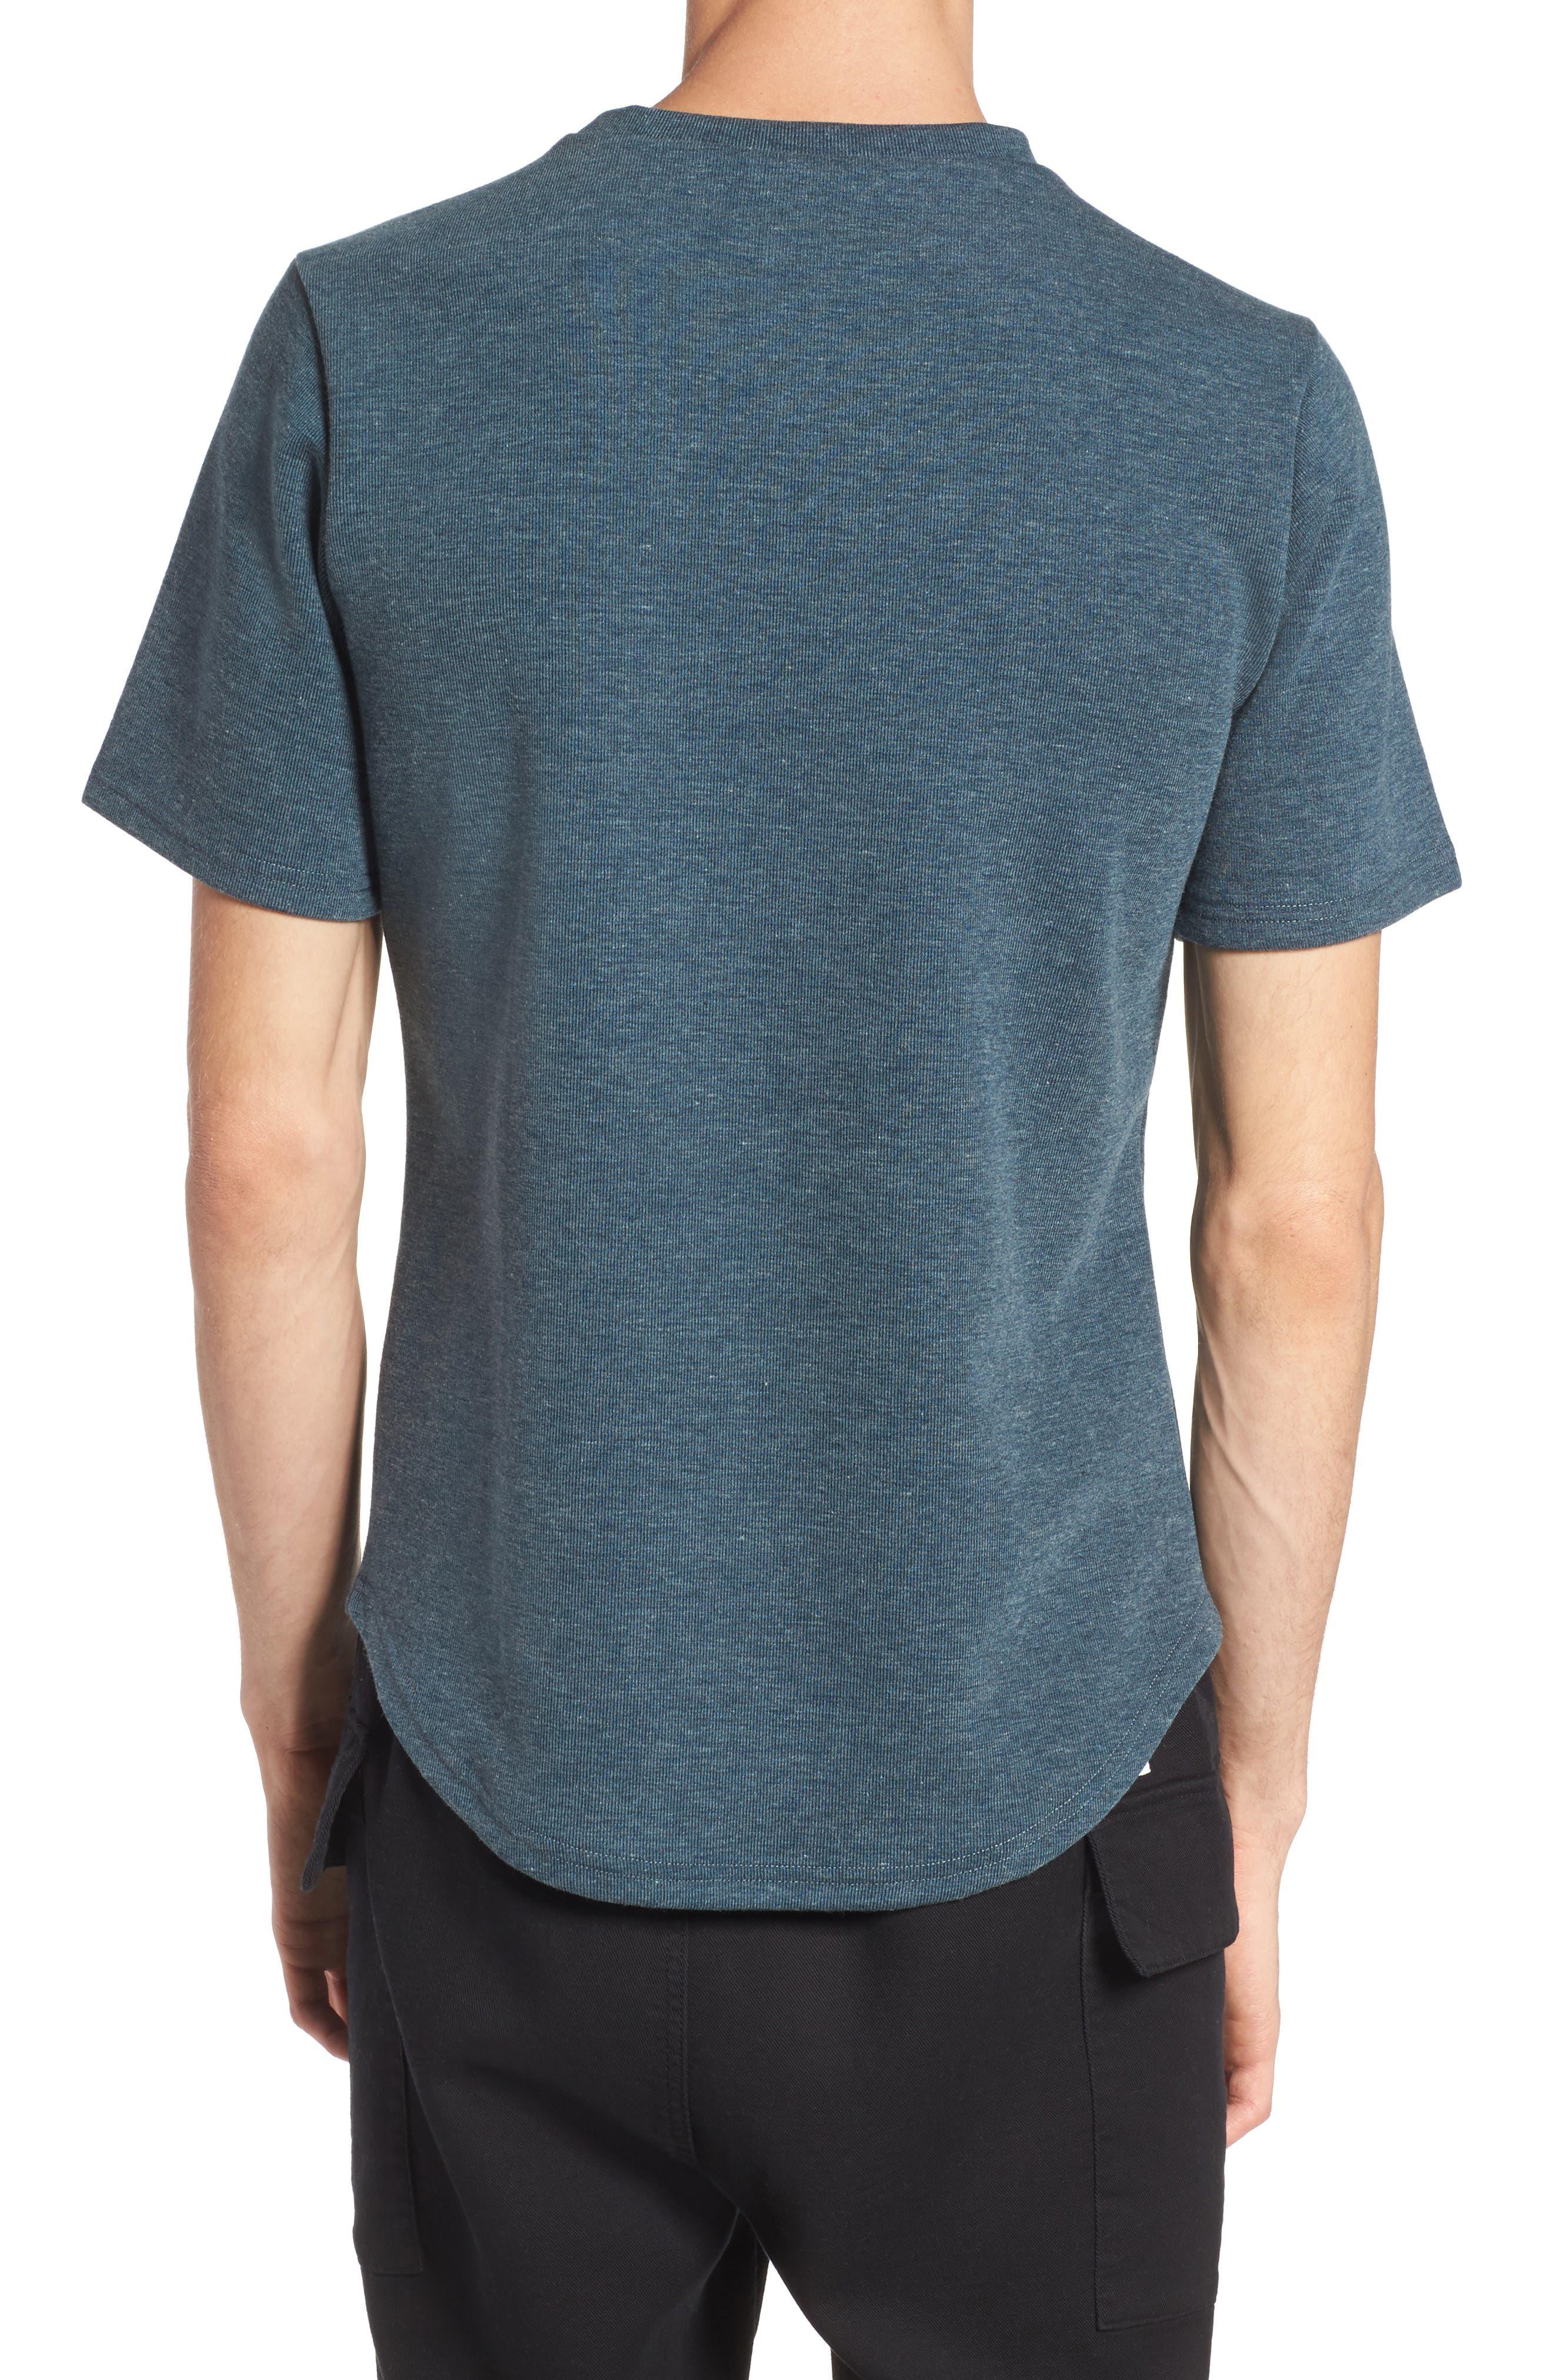 Onyx T-Shirt,                             Alternate thumbnail 2, color,                             Teal